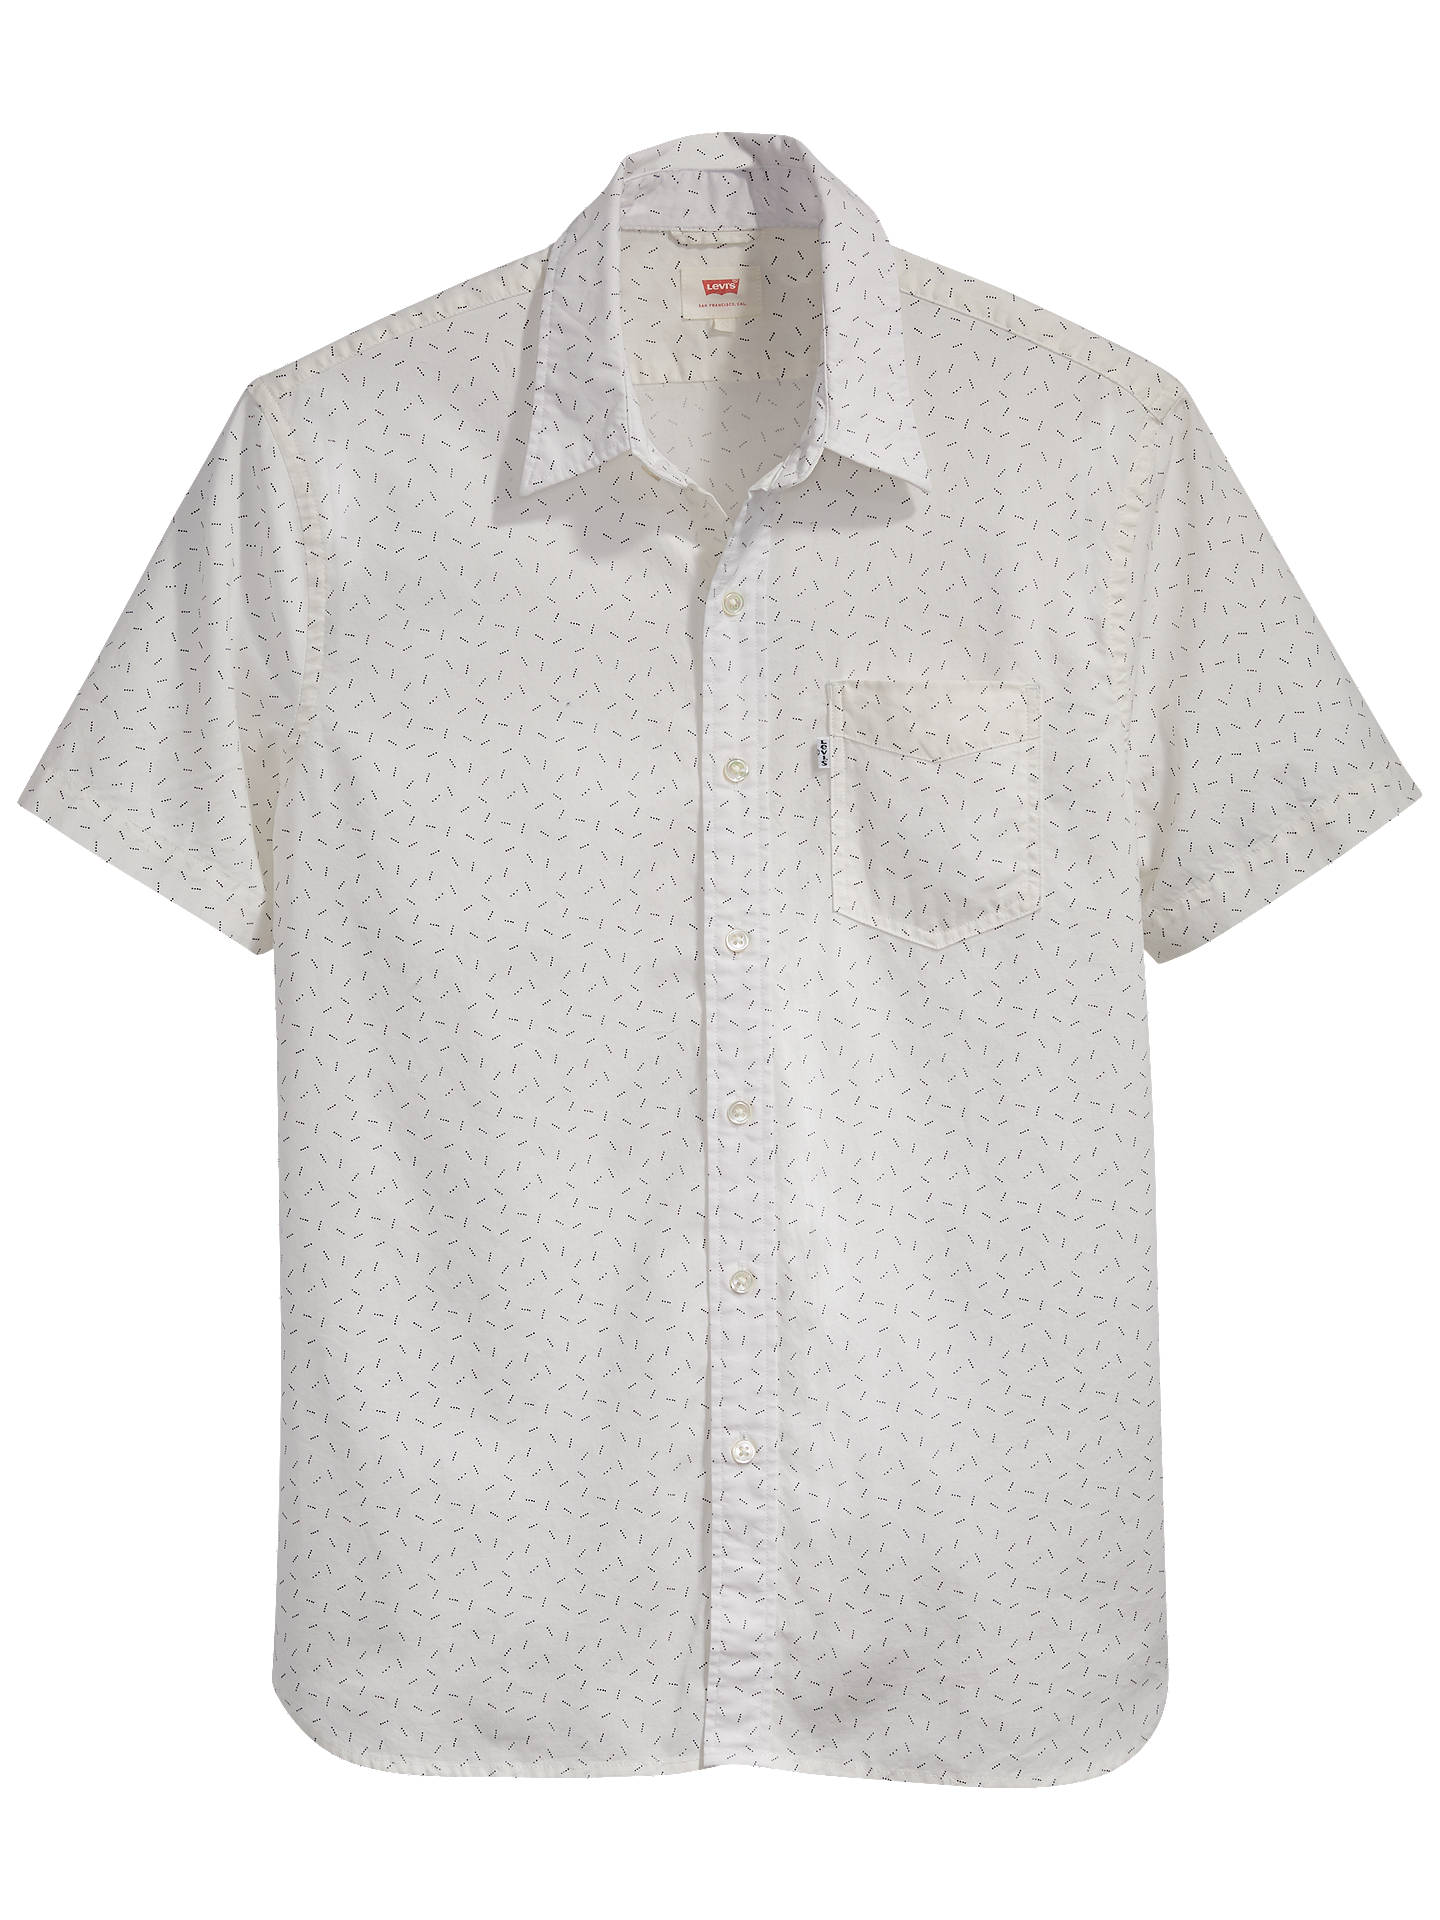 ... BuyLevi's Sunset One Pocket Short Sleeve Shirt, Cowbird Marshmallow/Grey, S Online at